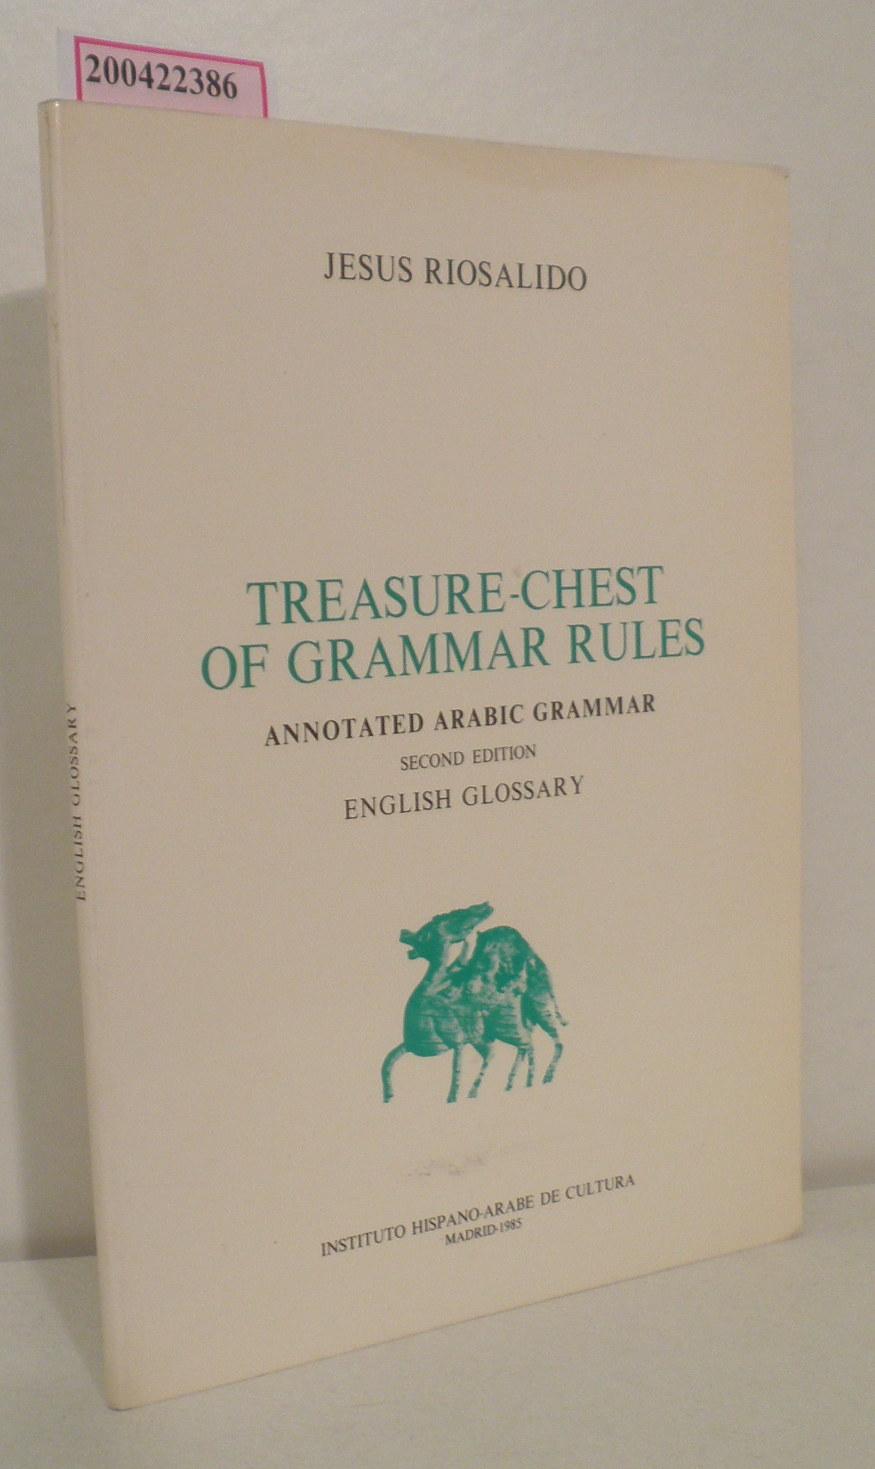 Treasure-Chest of Grammar Rules Annotated Arabic Grammar